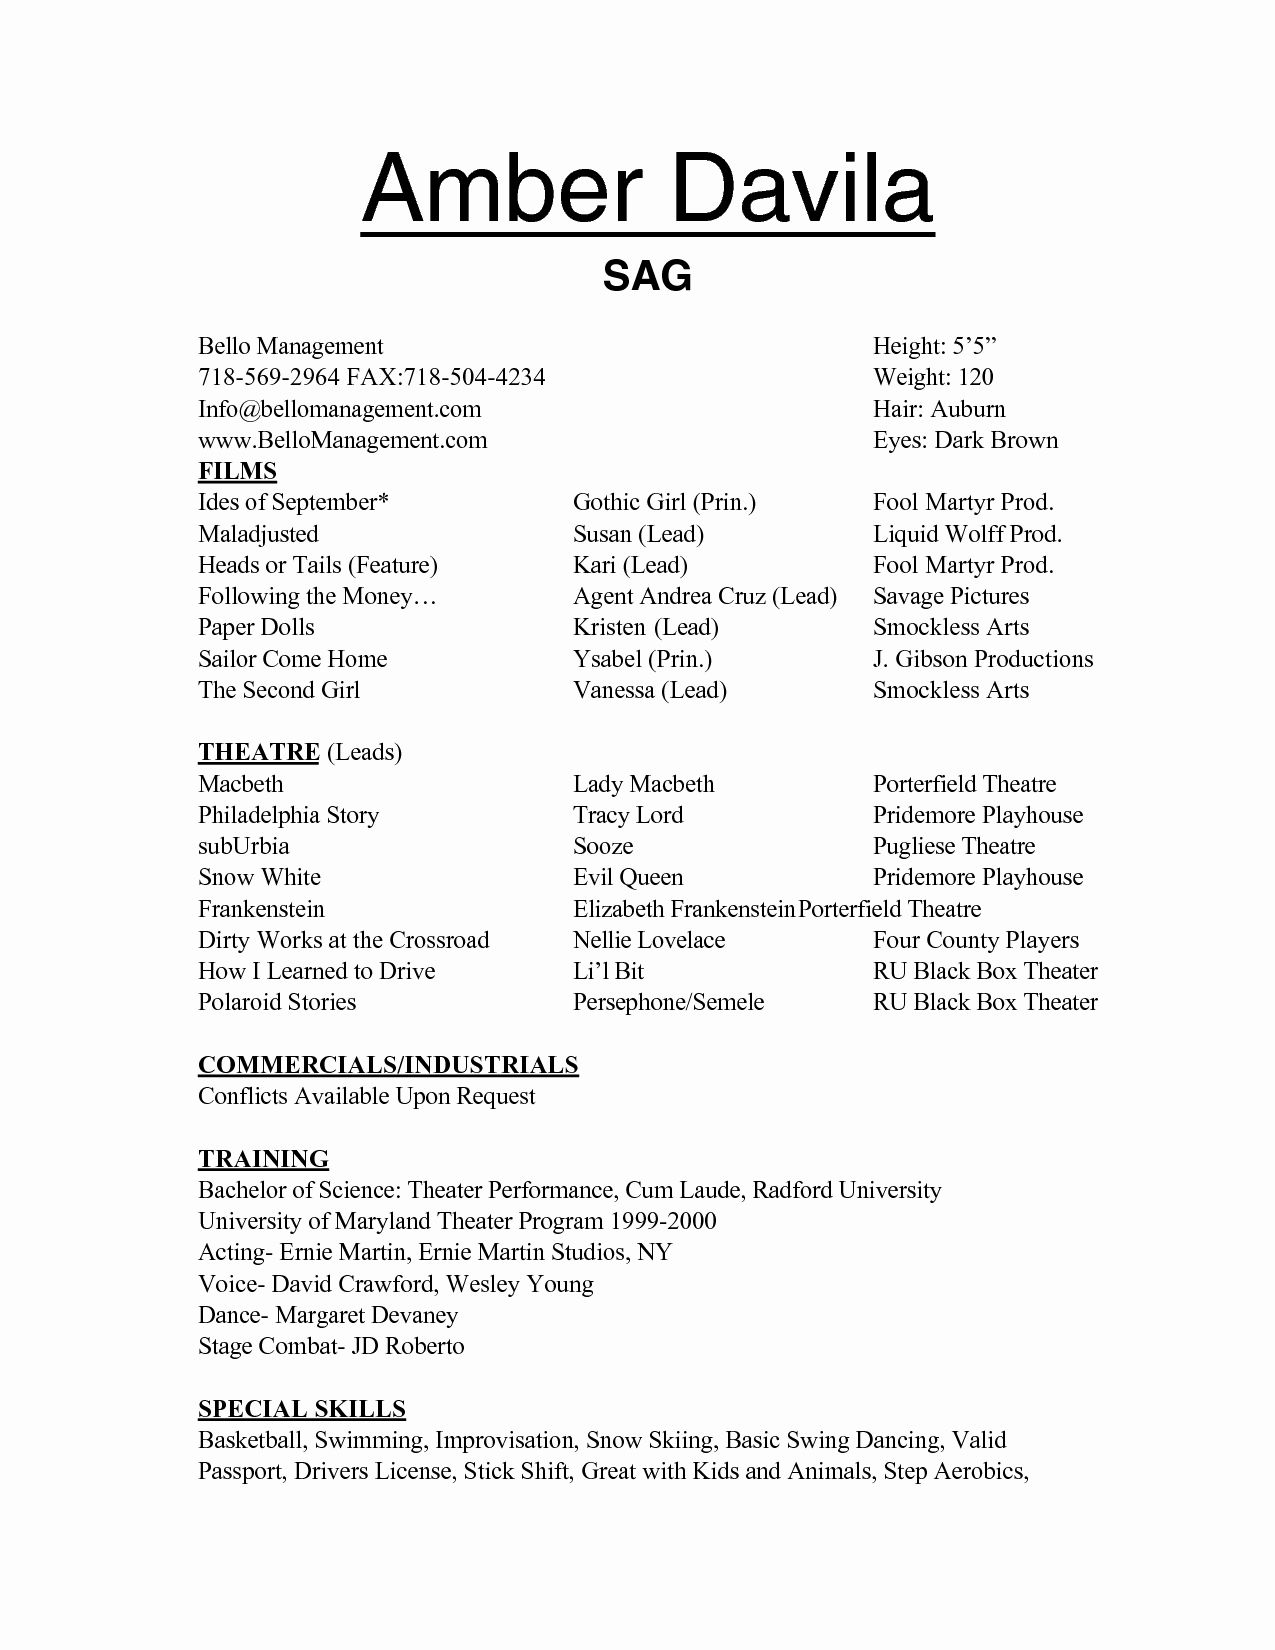 Beginner Actor Resume Template New Free Acting Resume